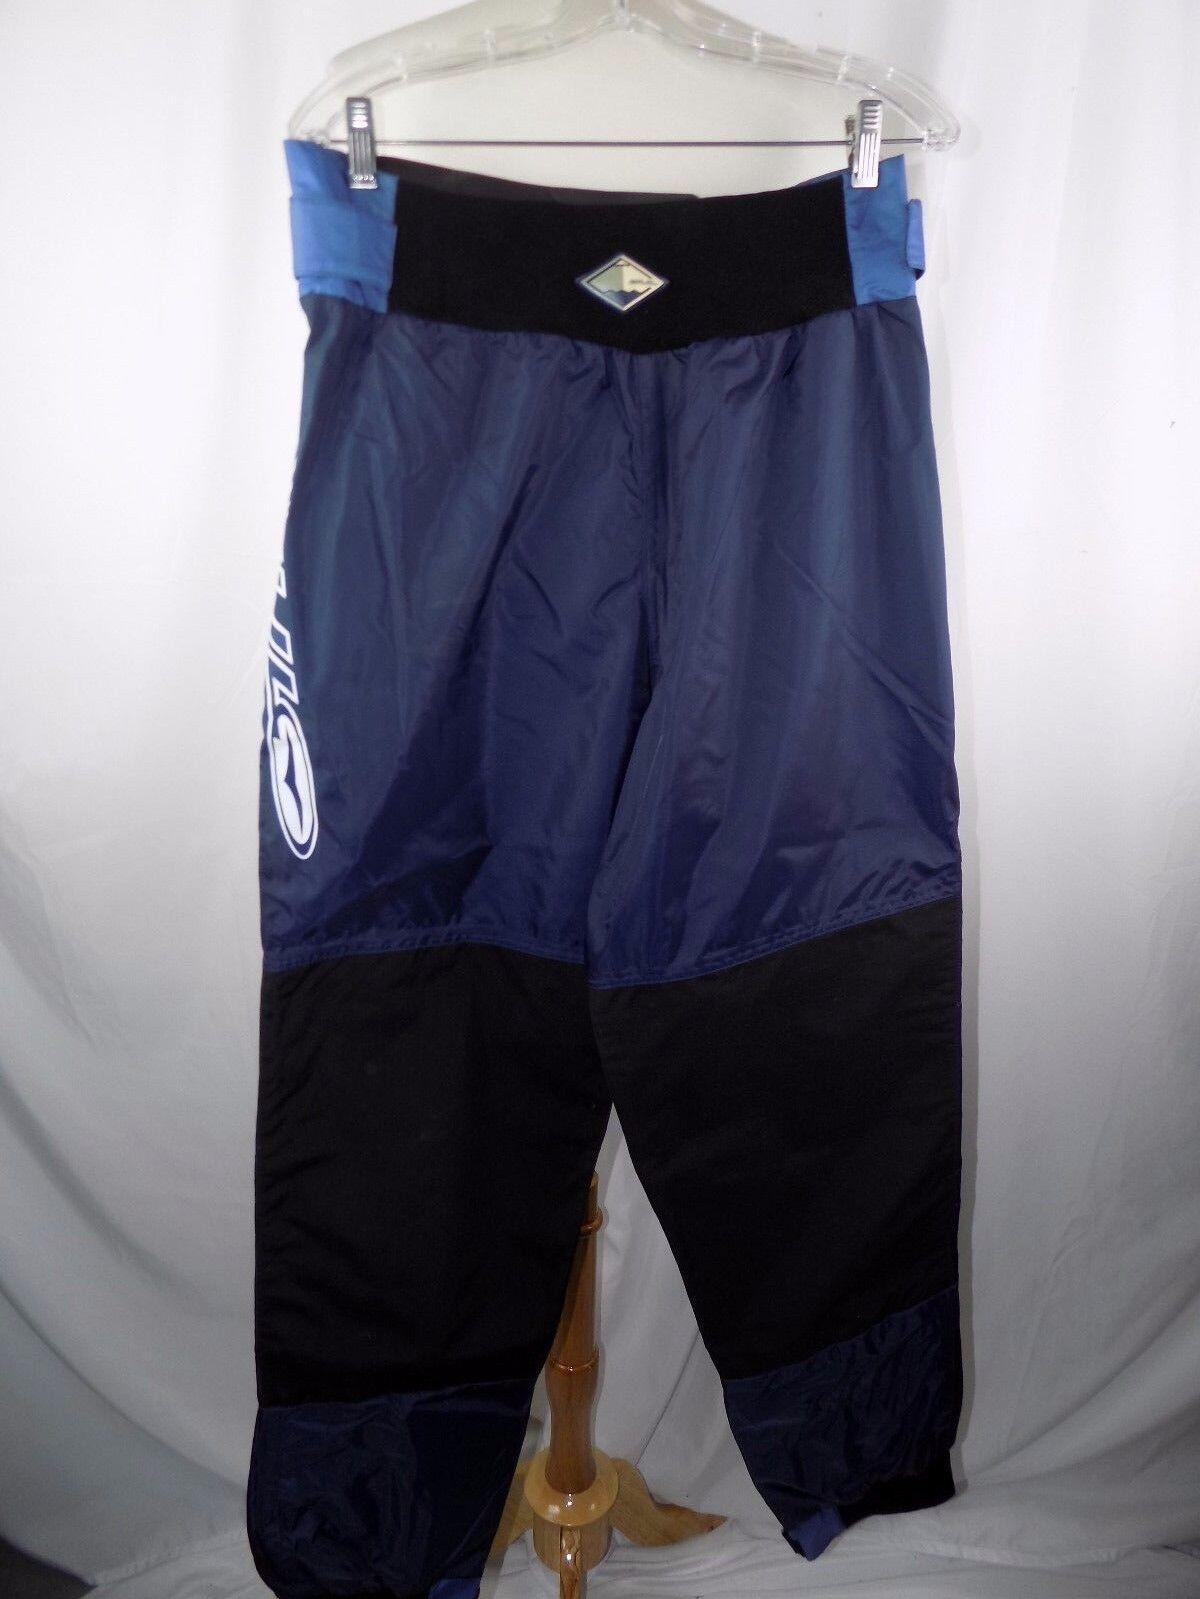 Gul Kayak Trousers Navy blueee Nylon Men's Small Waist 30-34 Inseam 35